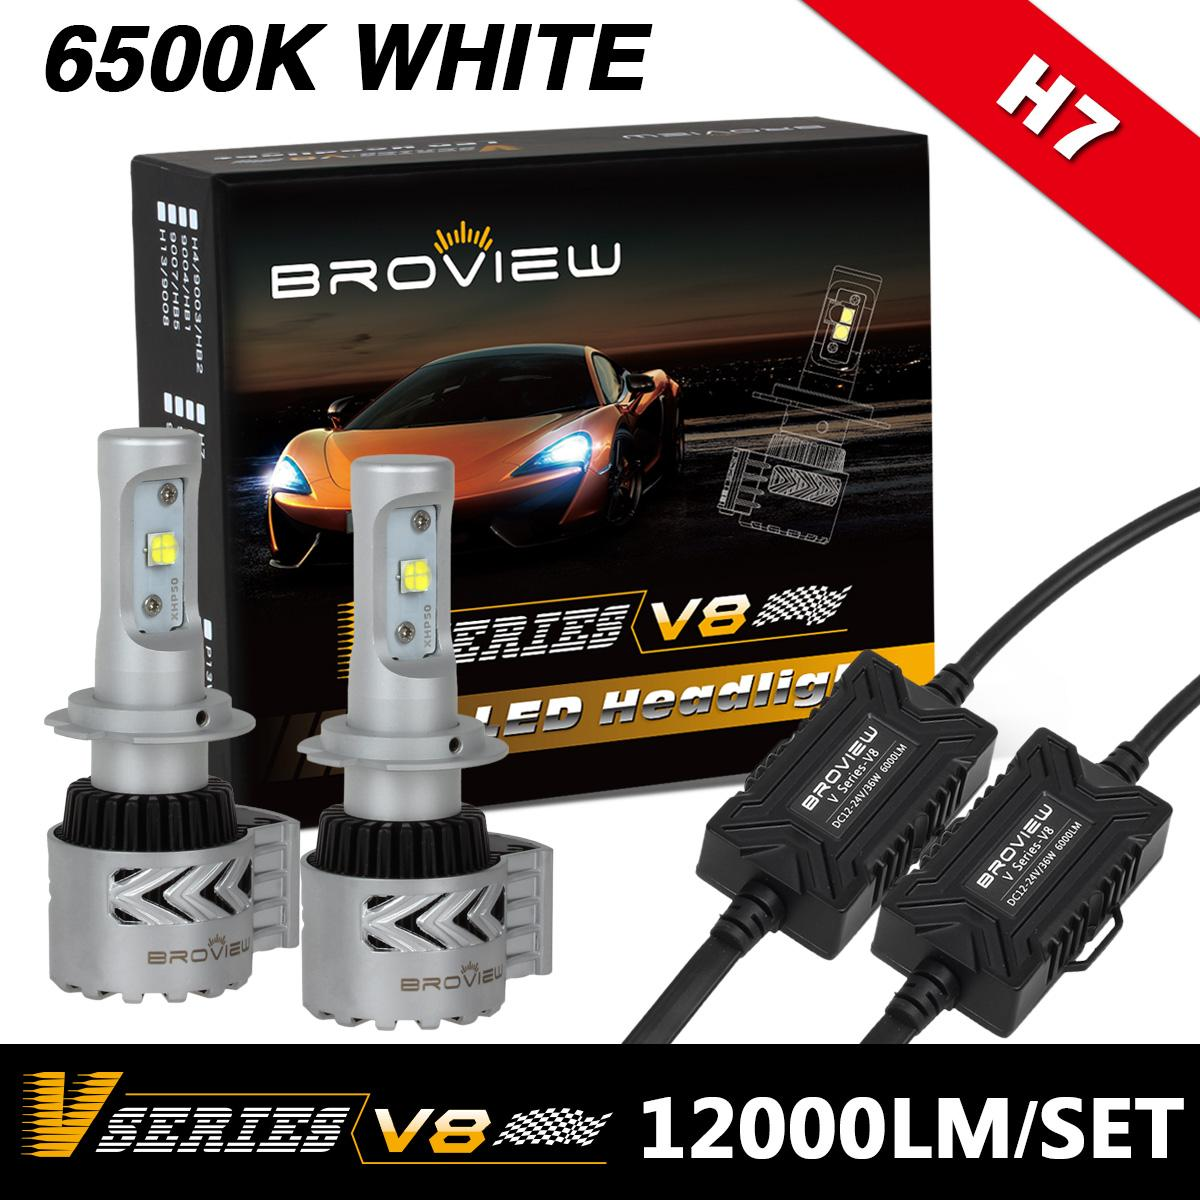 broview v8 6500k white h7 high power headlight conversion. Black Bedroom Furniture Sets. Home Design Ideas